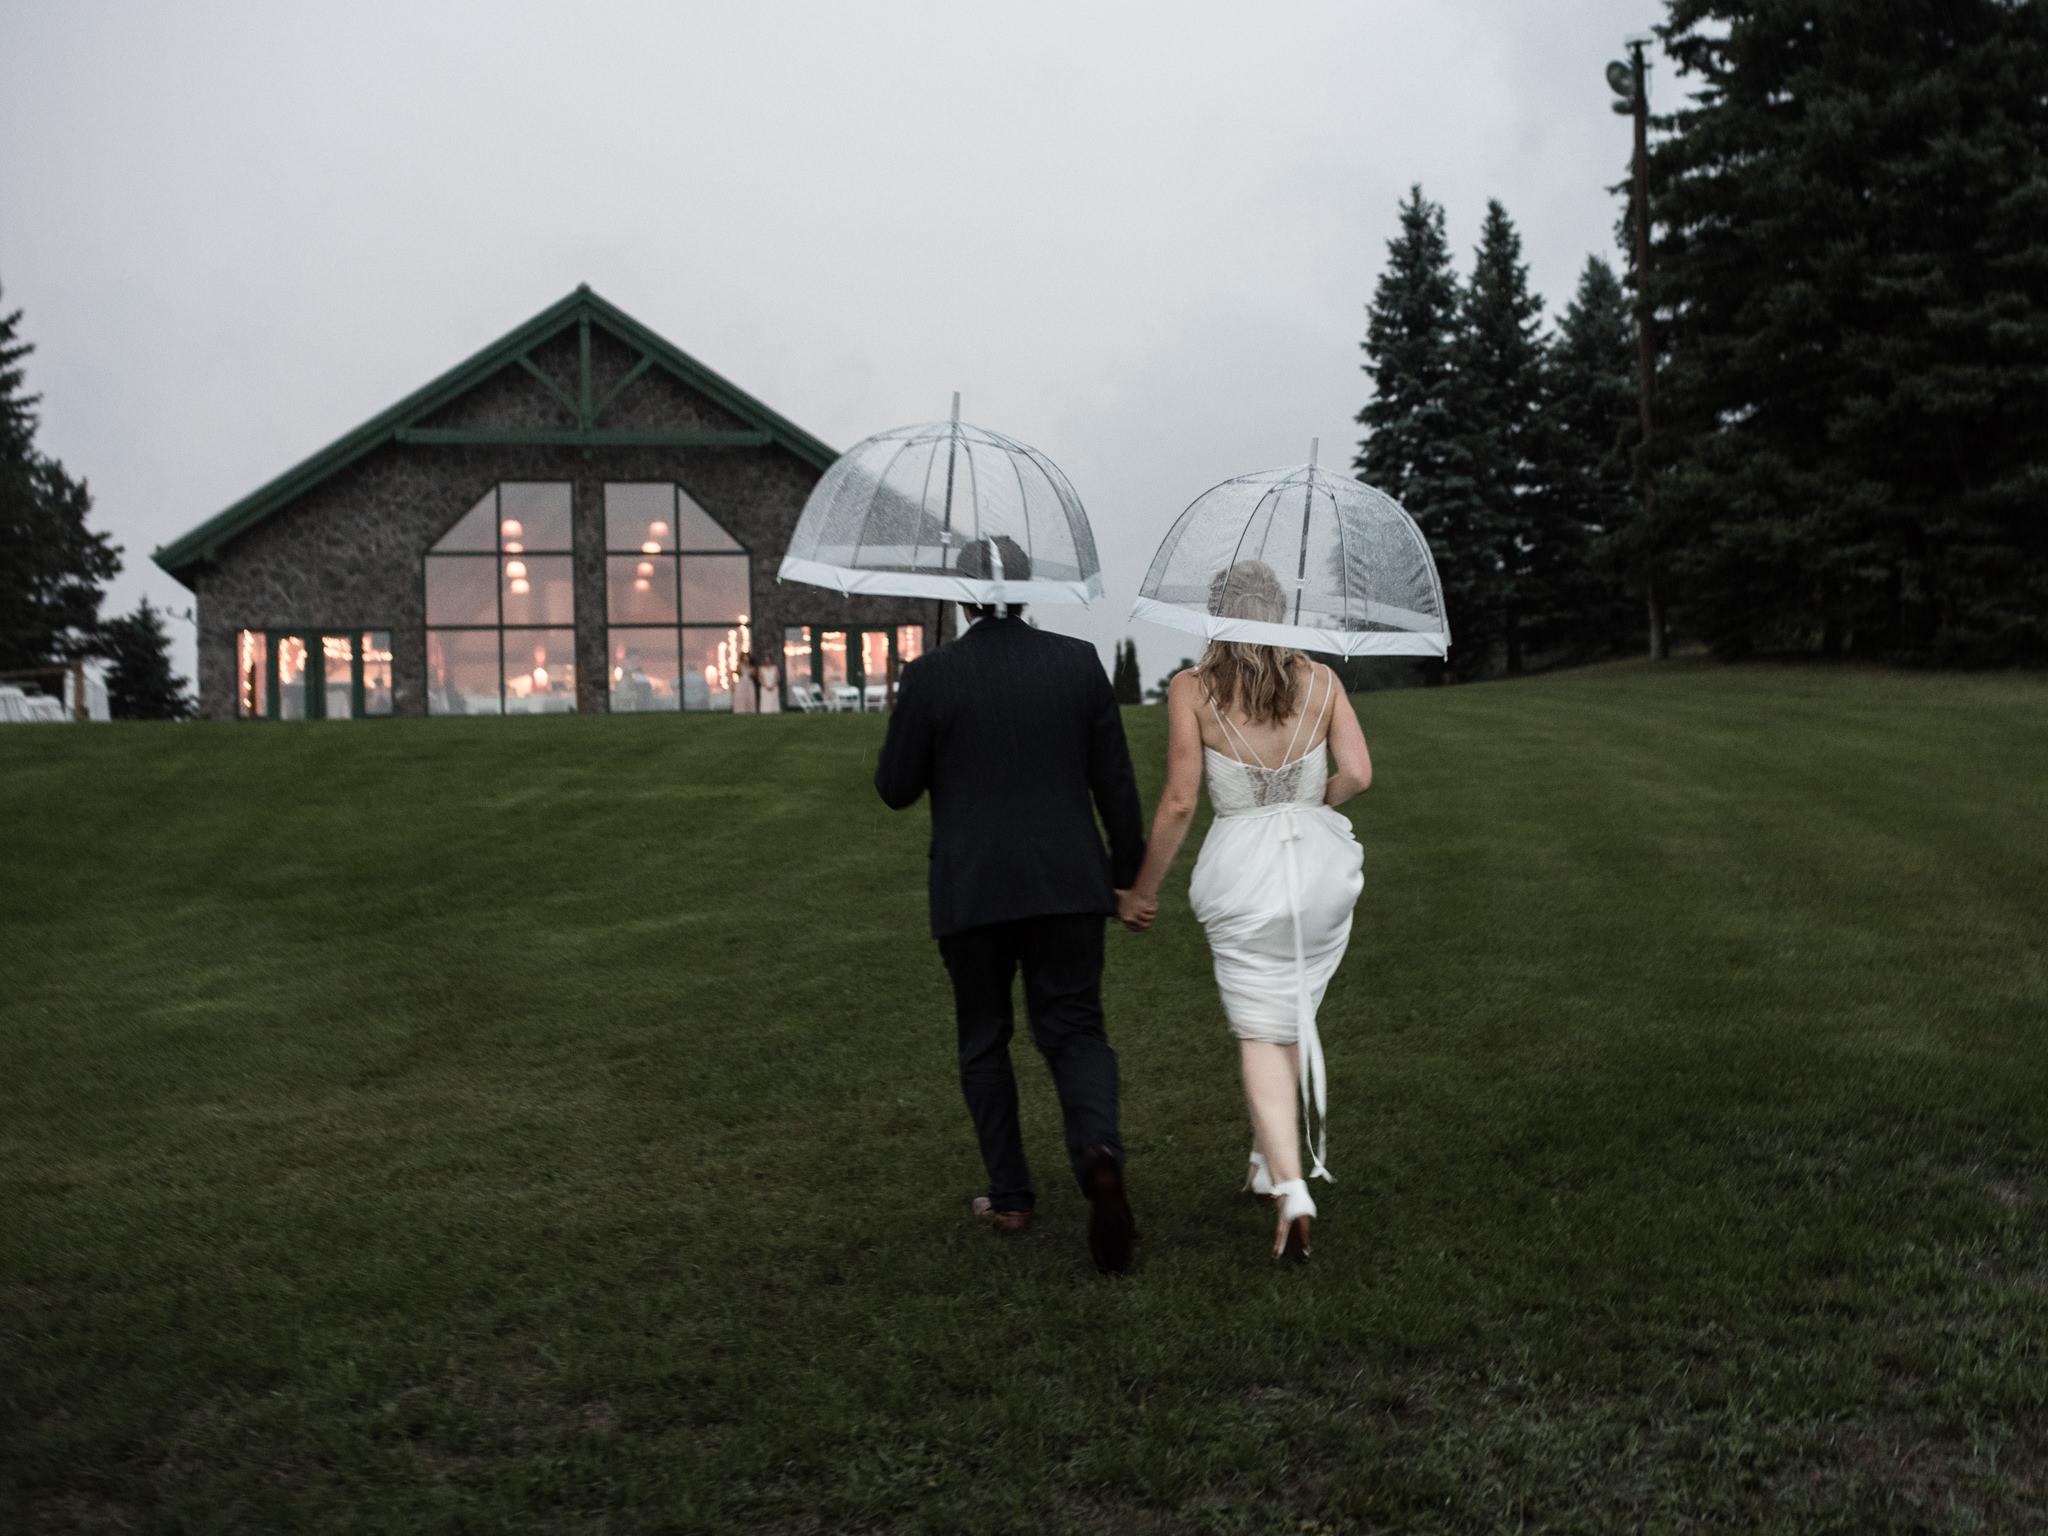 skyloft-wedding-toronto-wedding-photographer-66.jpg